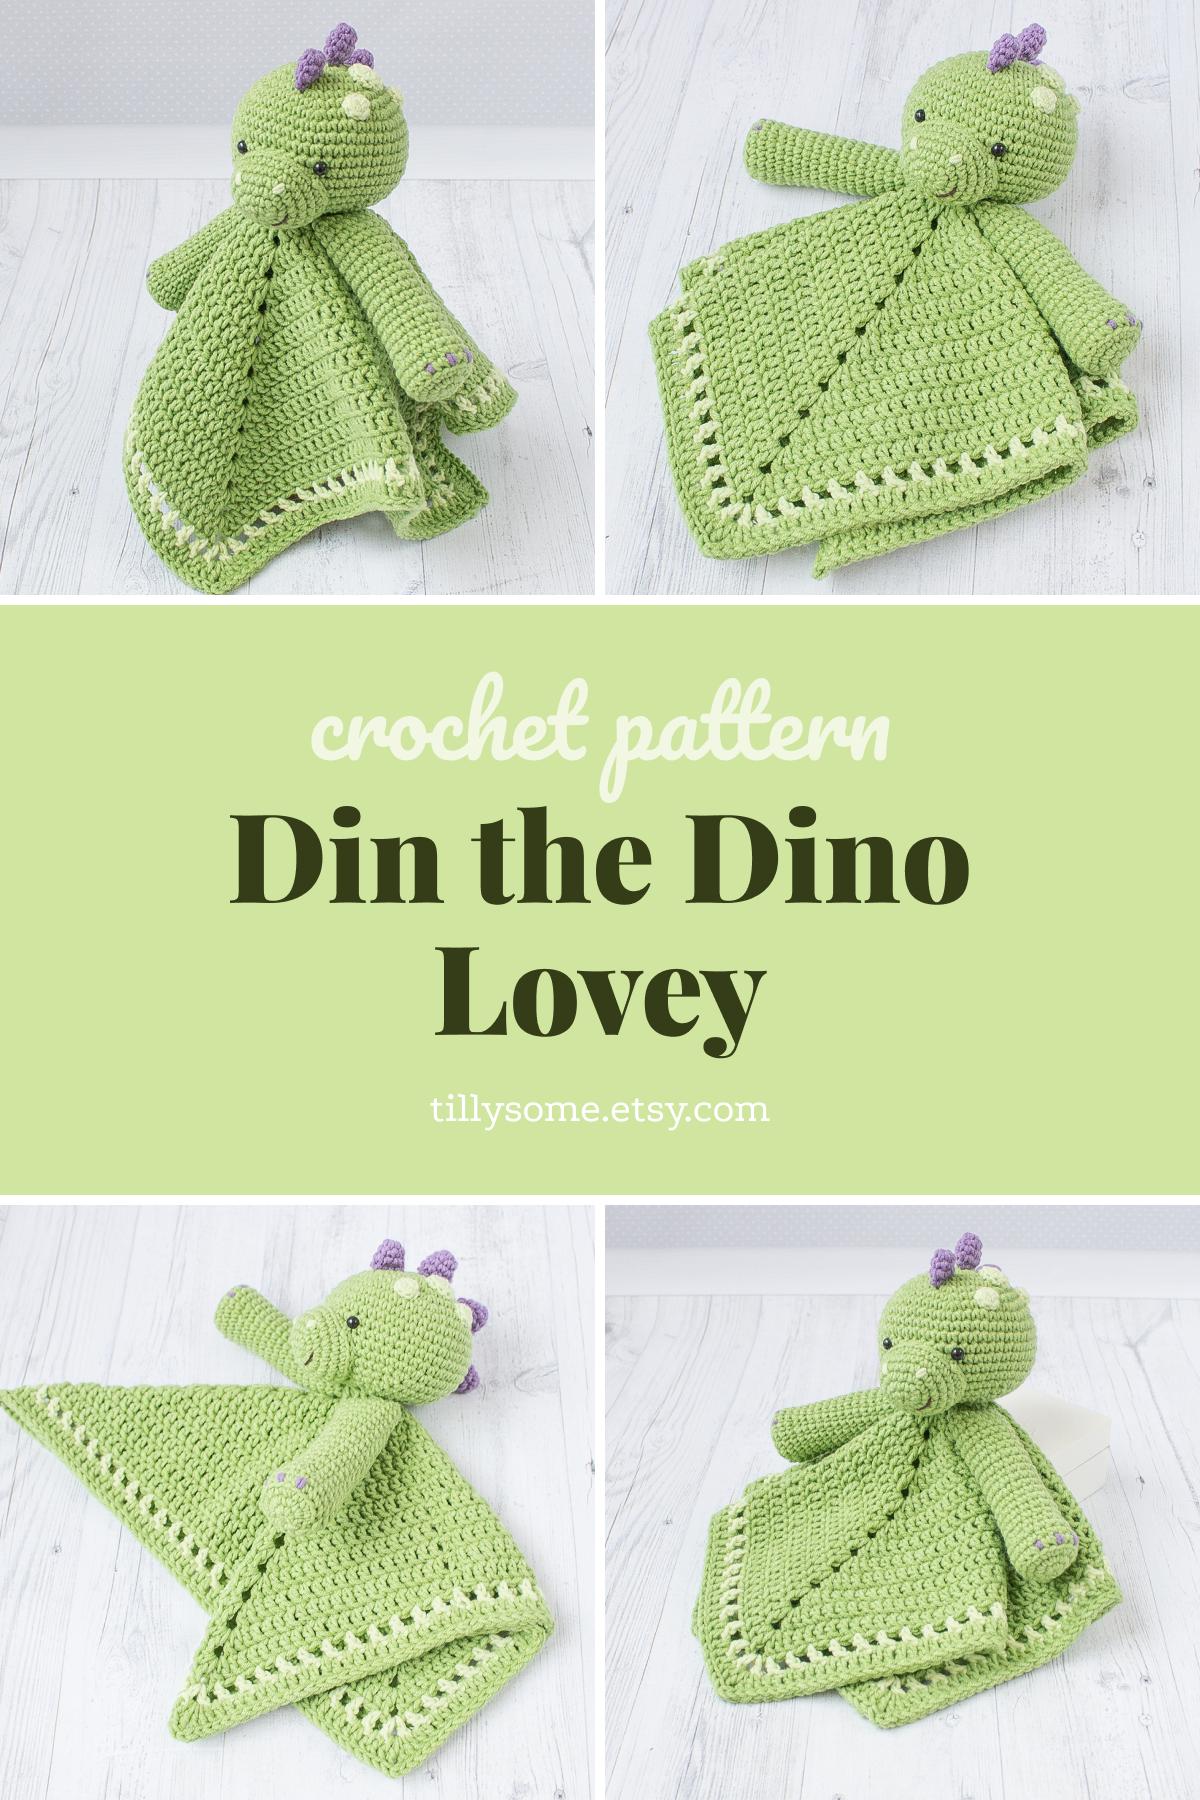 Crochet Pattern Security Blanket Din the Dino Lovey | Security Blanket Pattern | Crochet Lovey Pattern | Baby Animal Blanket — PDF Crochet